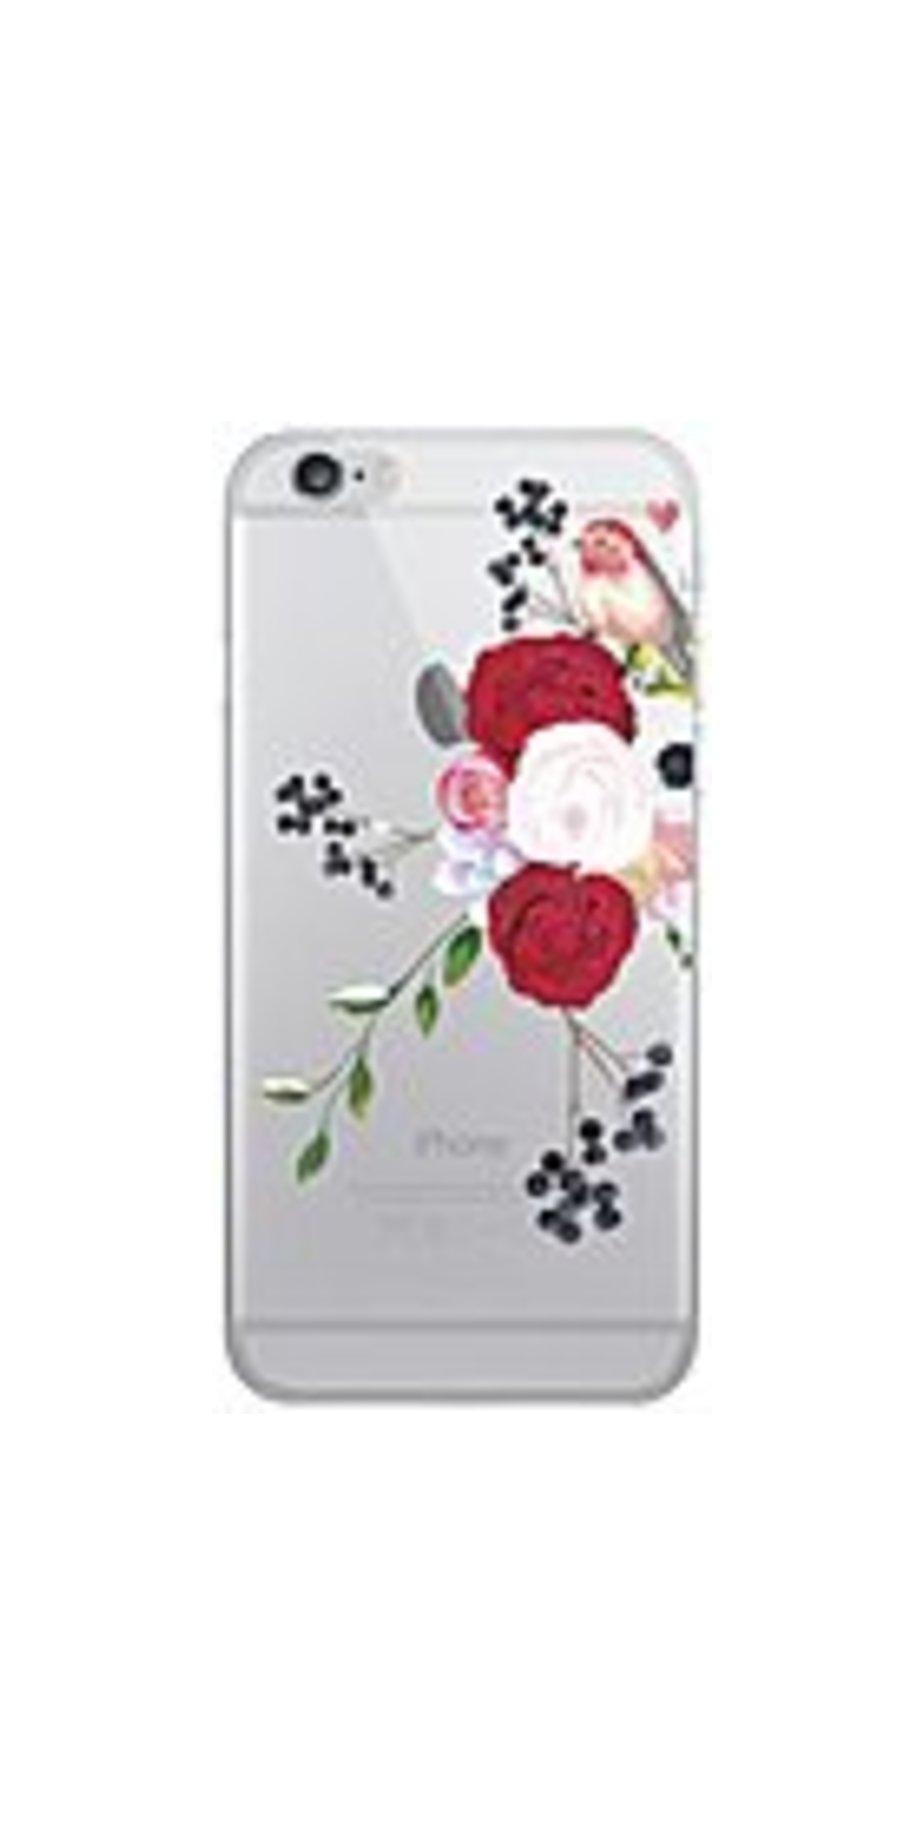 Otm Iphone 7/6/6s Plus Hybrid Clear Phone Case, Winter Bird - Iphone 7 Plus, Iphone 6 Plus, Iphone 6s Plus - Clear - Winter Bird